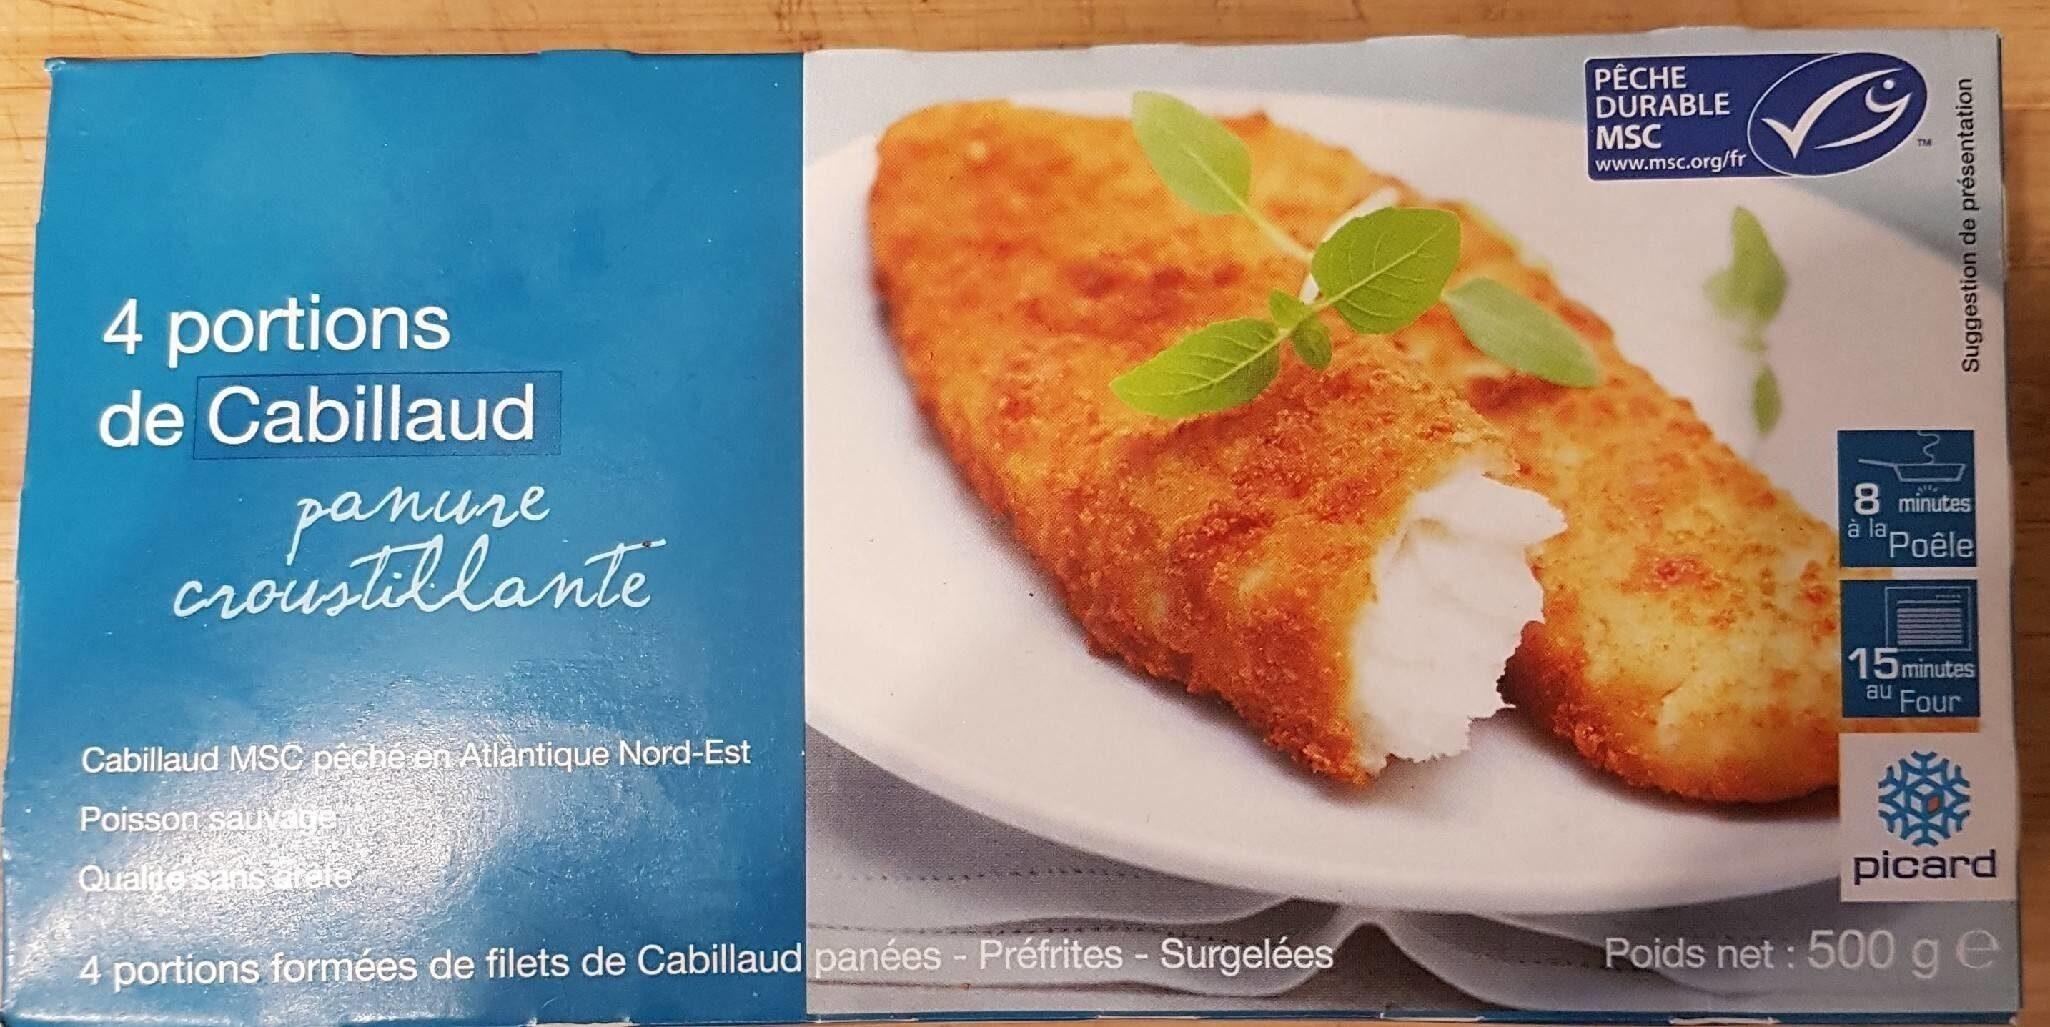 Cabillaud panure croustillantes - Prodotto - fr